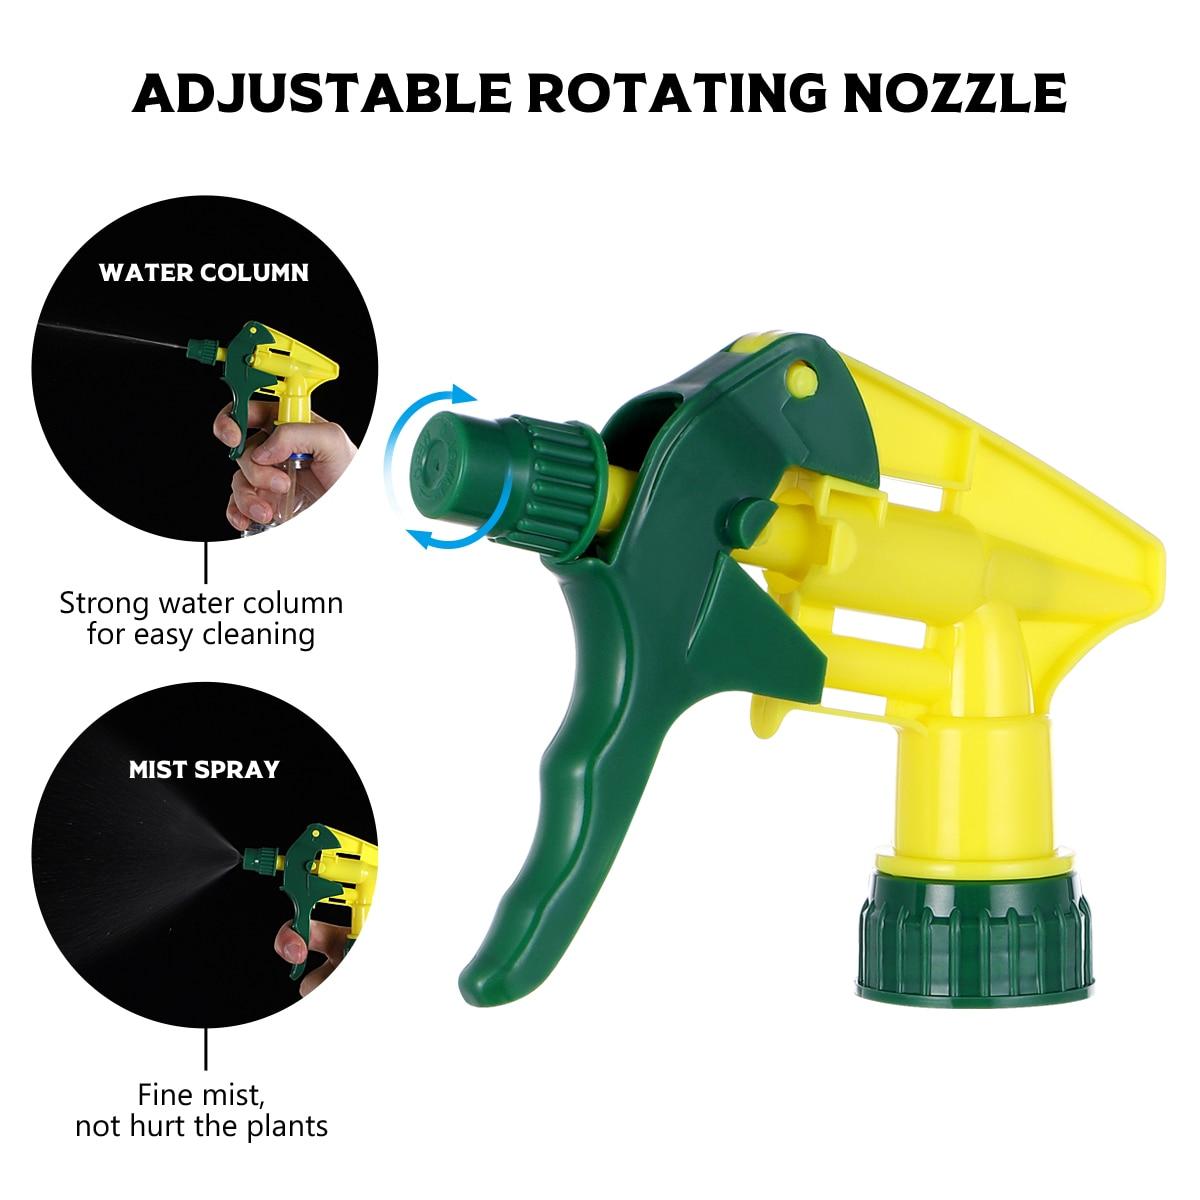 10pcs Universal Spray Bottle Trigger Replacement Plastic Spray Nozzles Thicken Sprayer Replacement Trigger Spray Tops Spray Head-1